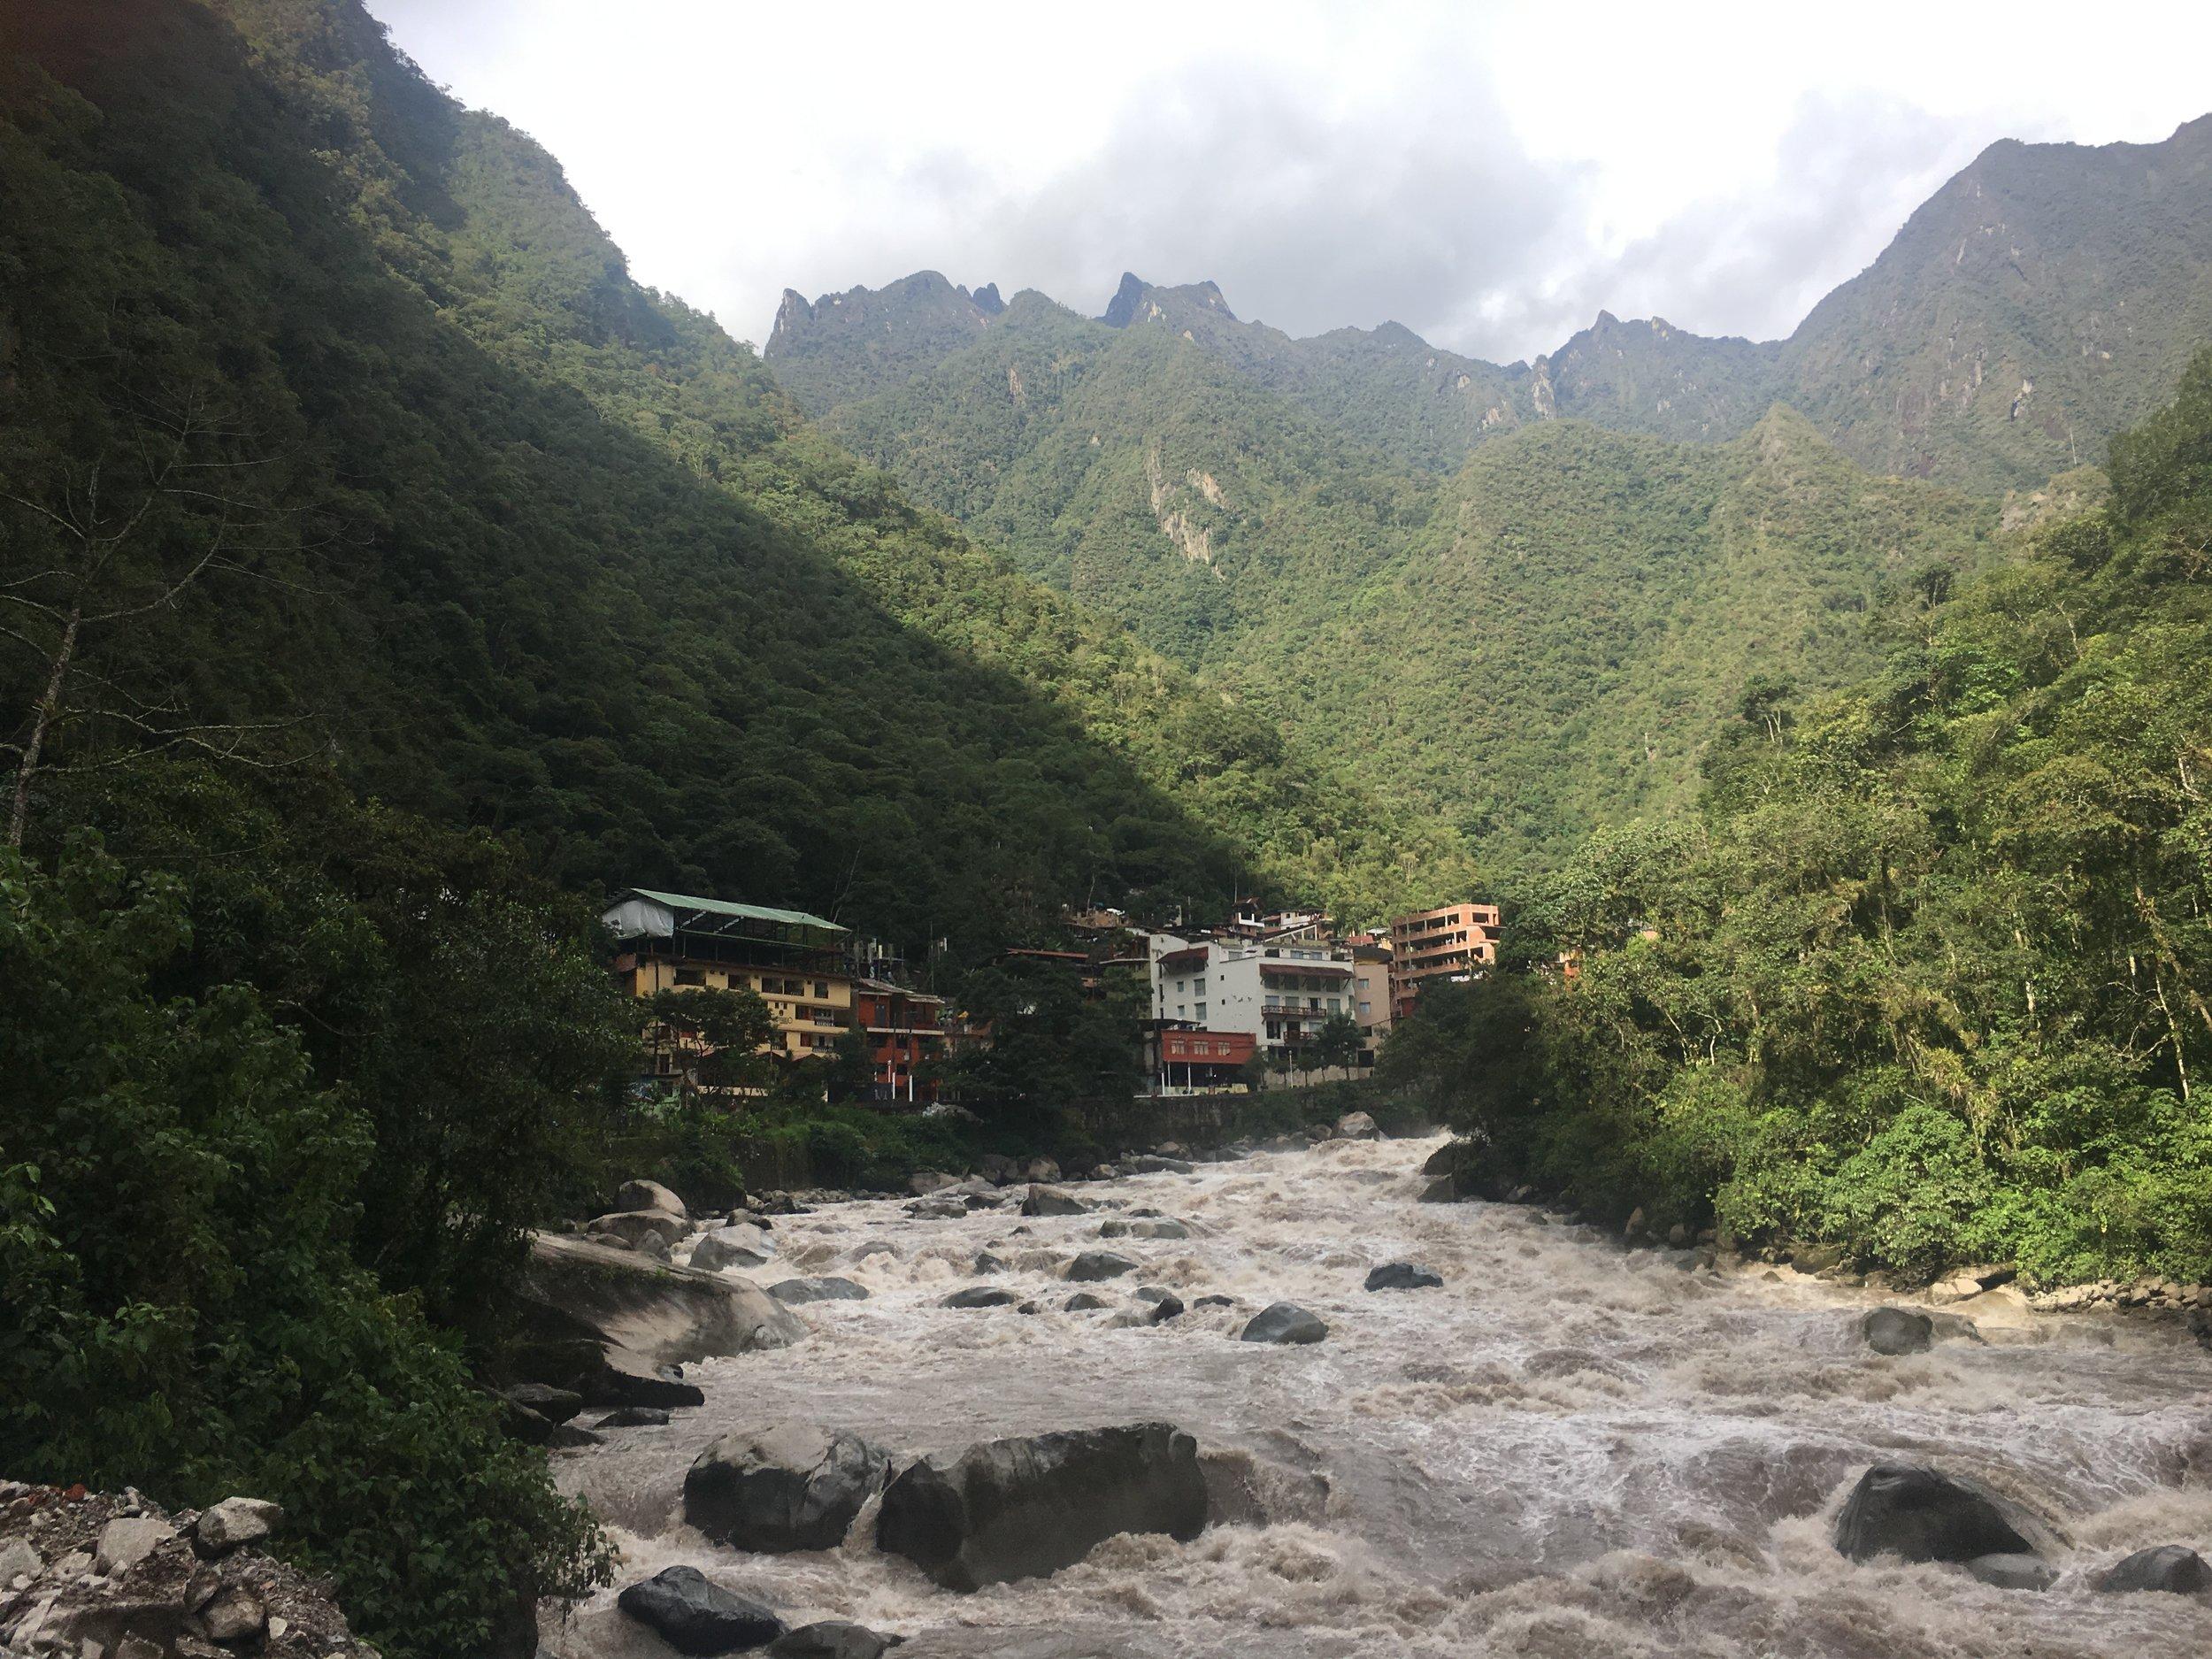 Aguas Calientes, aka Machu Picchu Pueblo - nestled in the Andes Mountains along the Urubamba River.